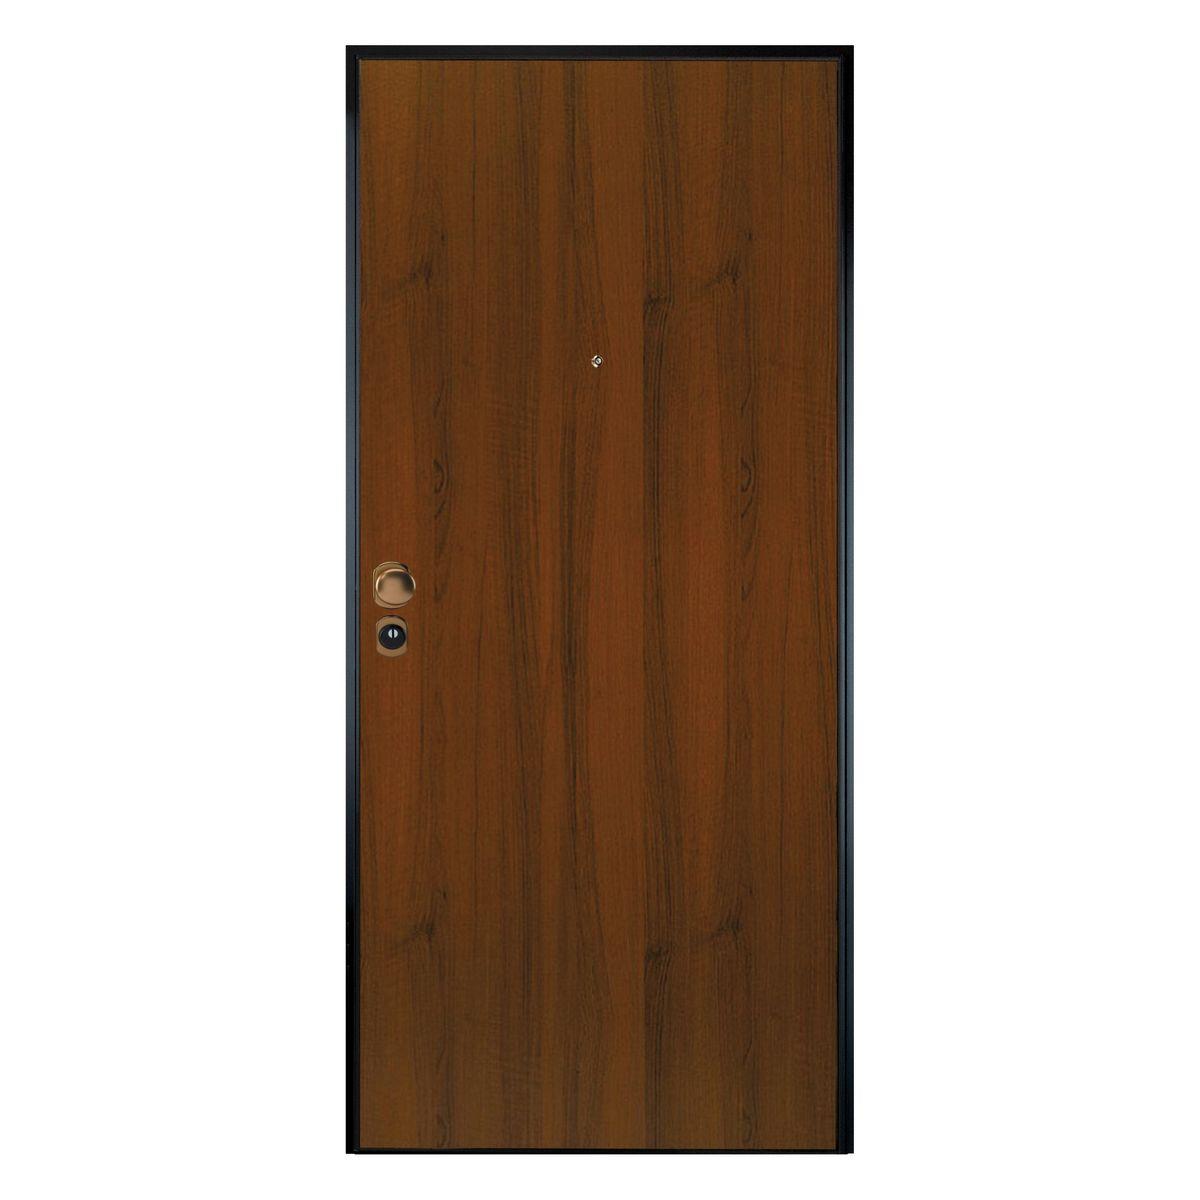 Porta blindata leopard noce l 90 x h 200 cm sx prezzi e for Paravento leroy merlin